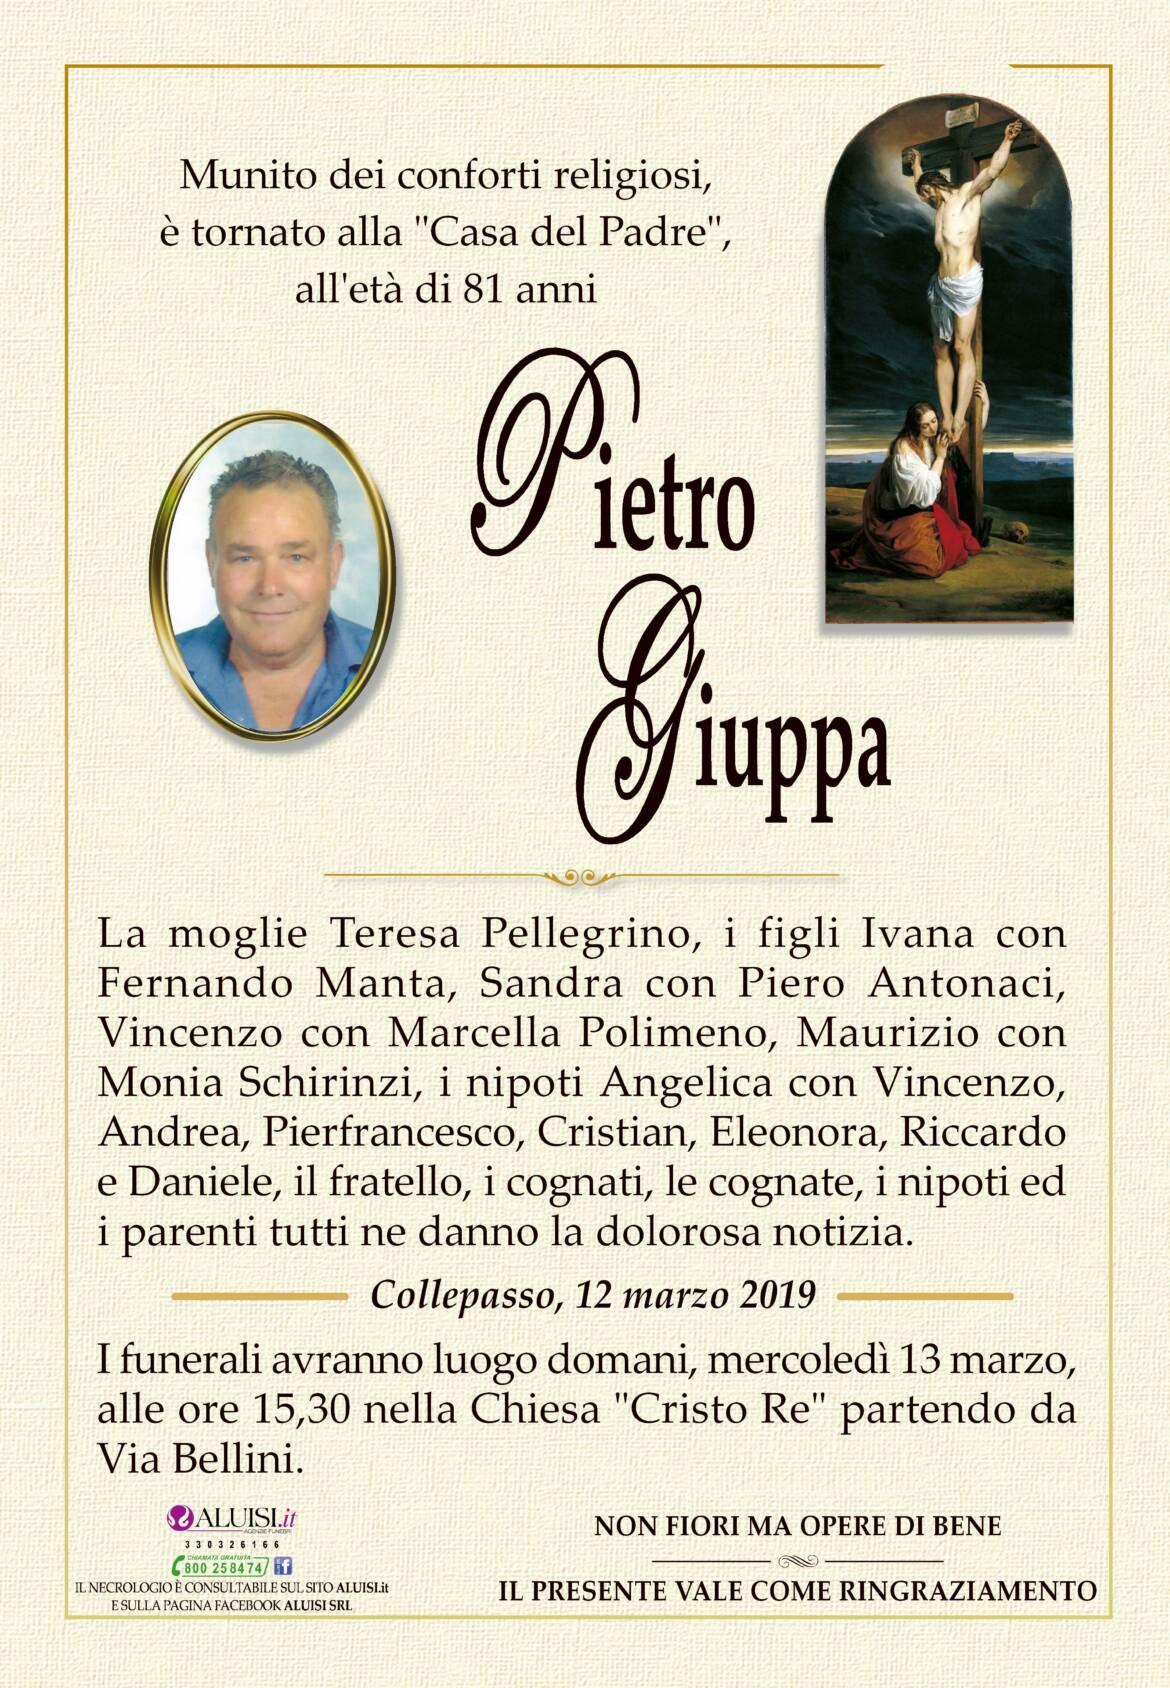 1-Annuncio-pietro-giuppa-fb.jpg